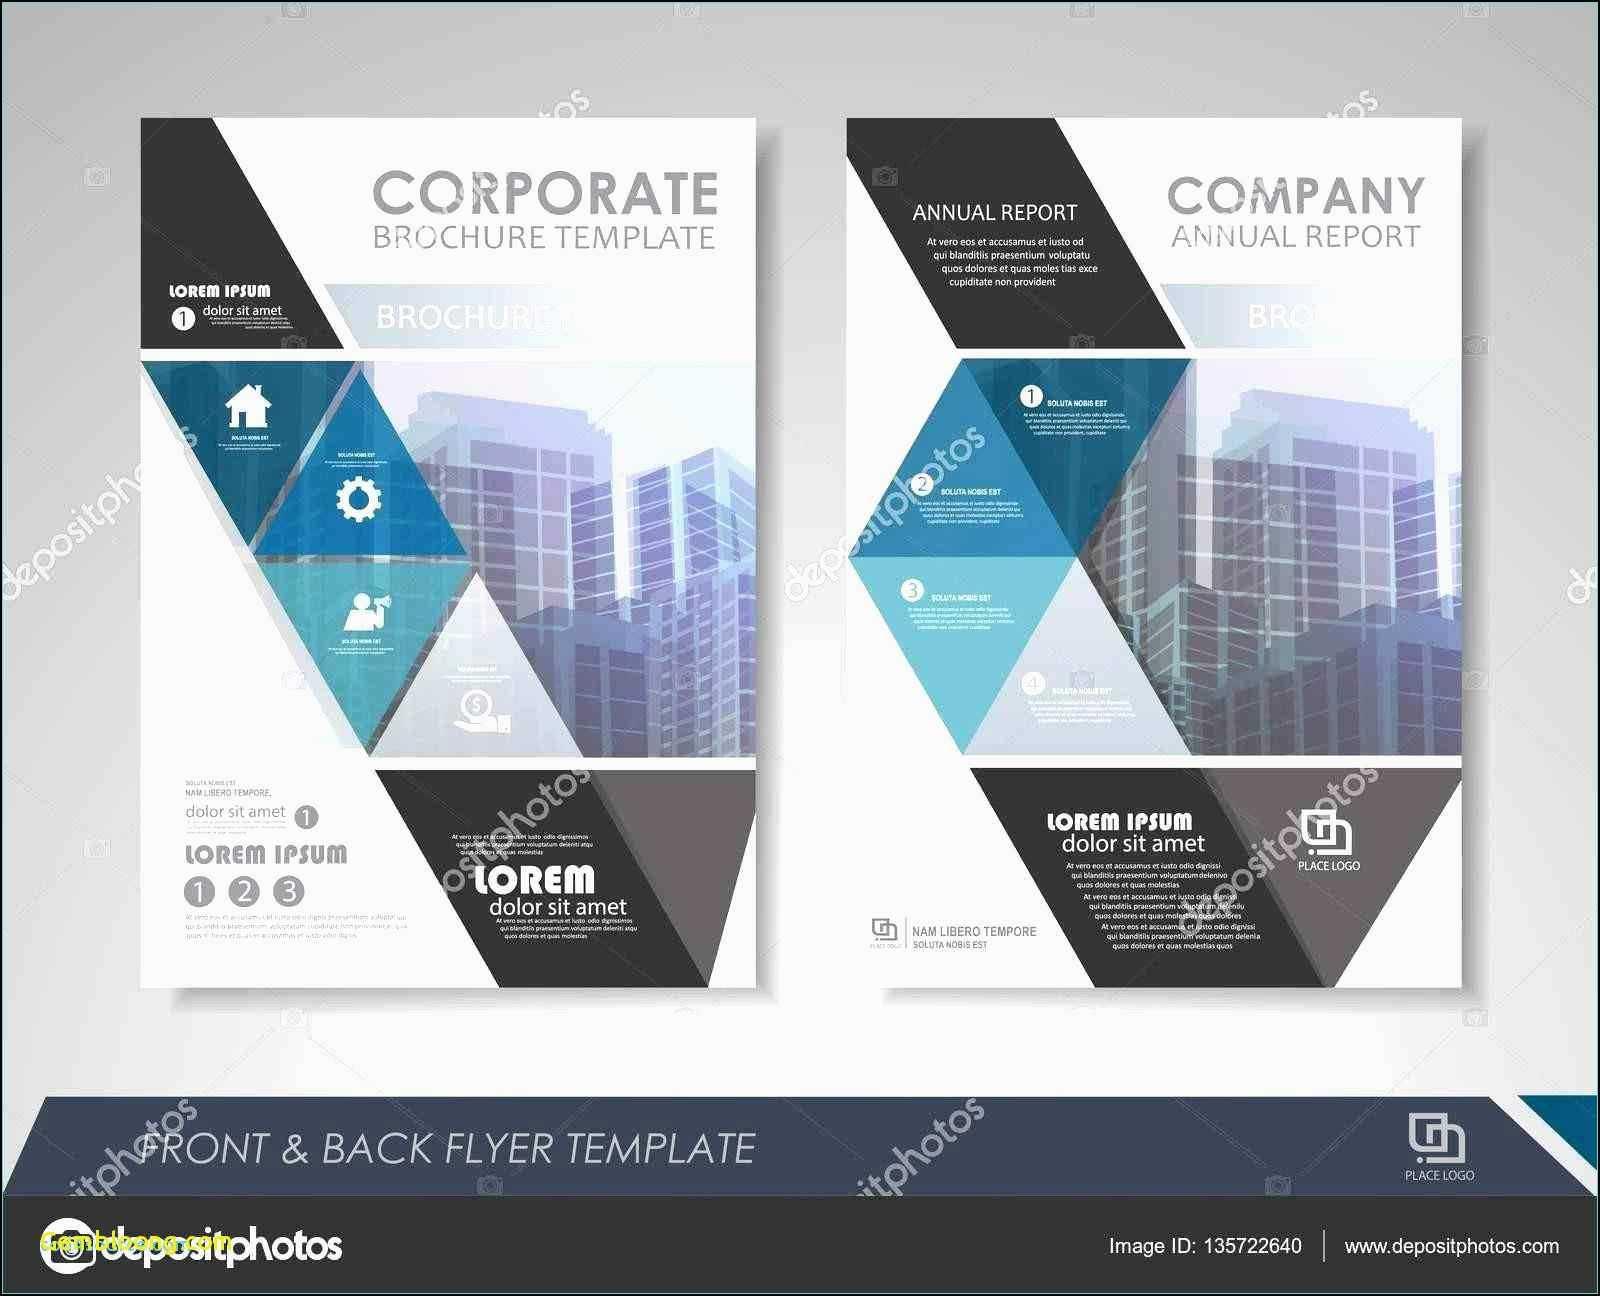 026 In Design Flyer Template Unbelievable Ideas Adobe Regarding Design Flyers Templates Online Free